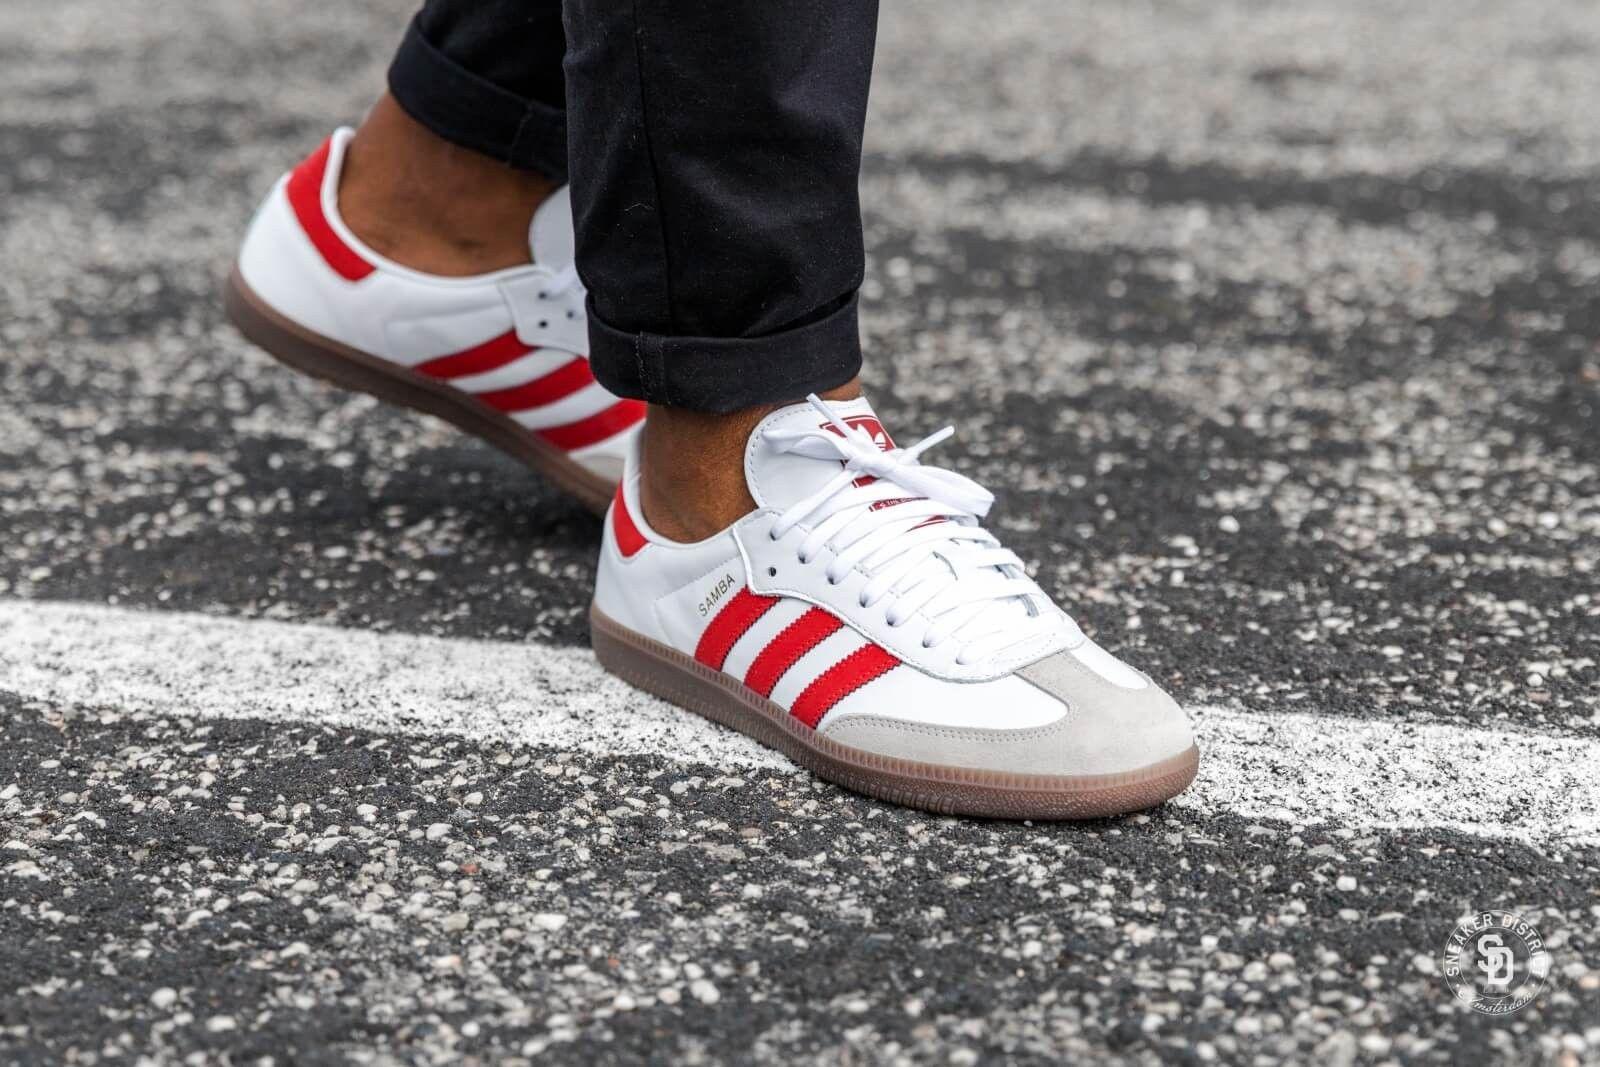 cec595d7 Adidas Samba OG Footwear White/Scarlet - B44628   Zapatos in 2019 ...